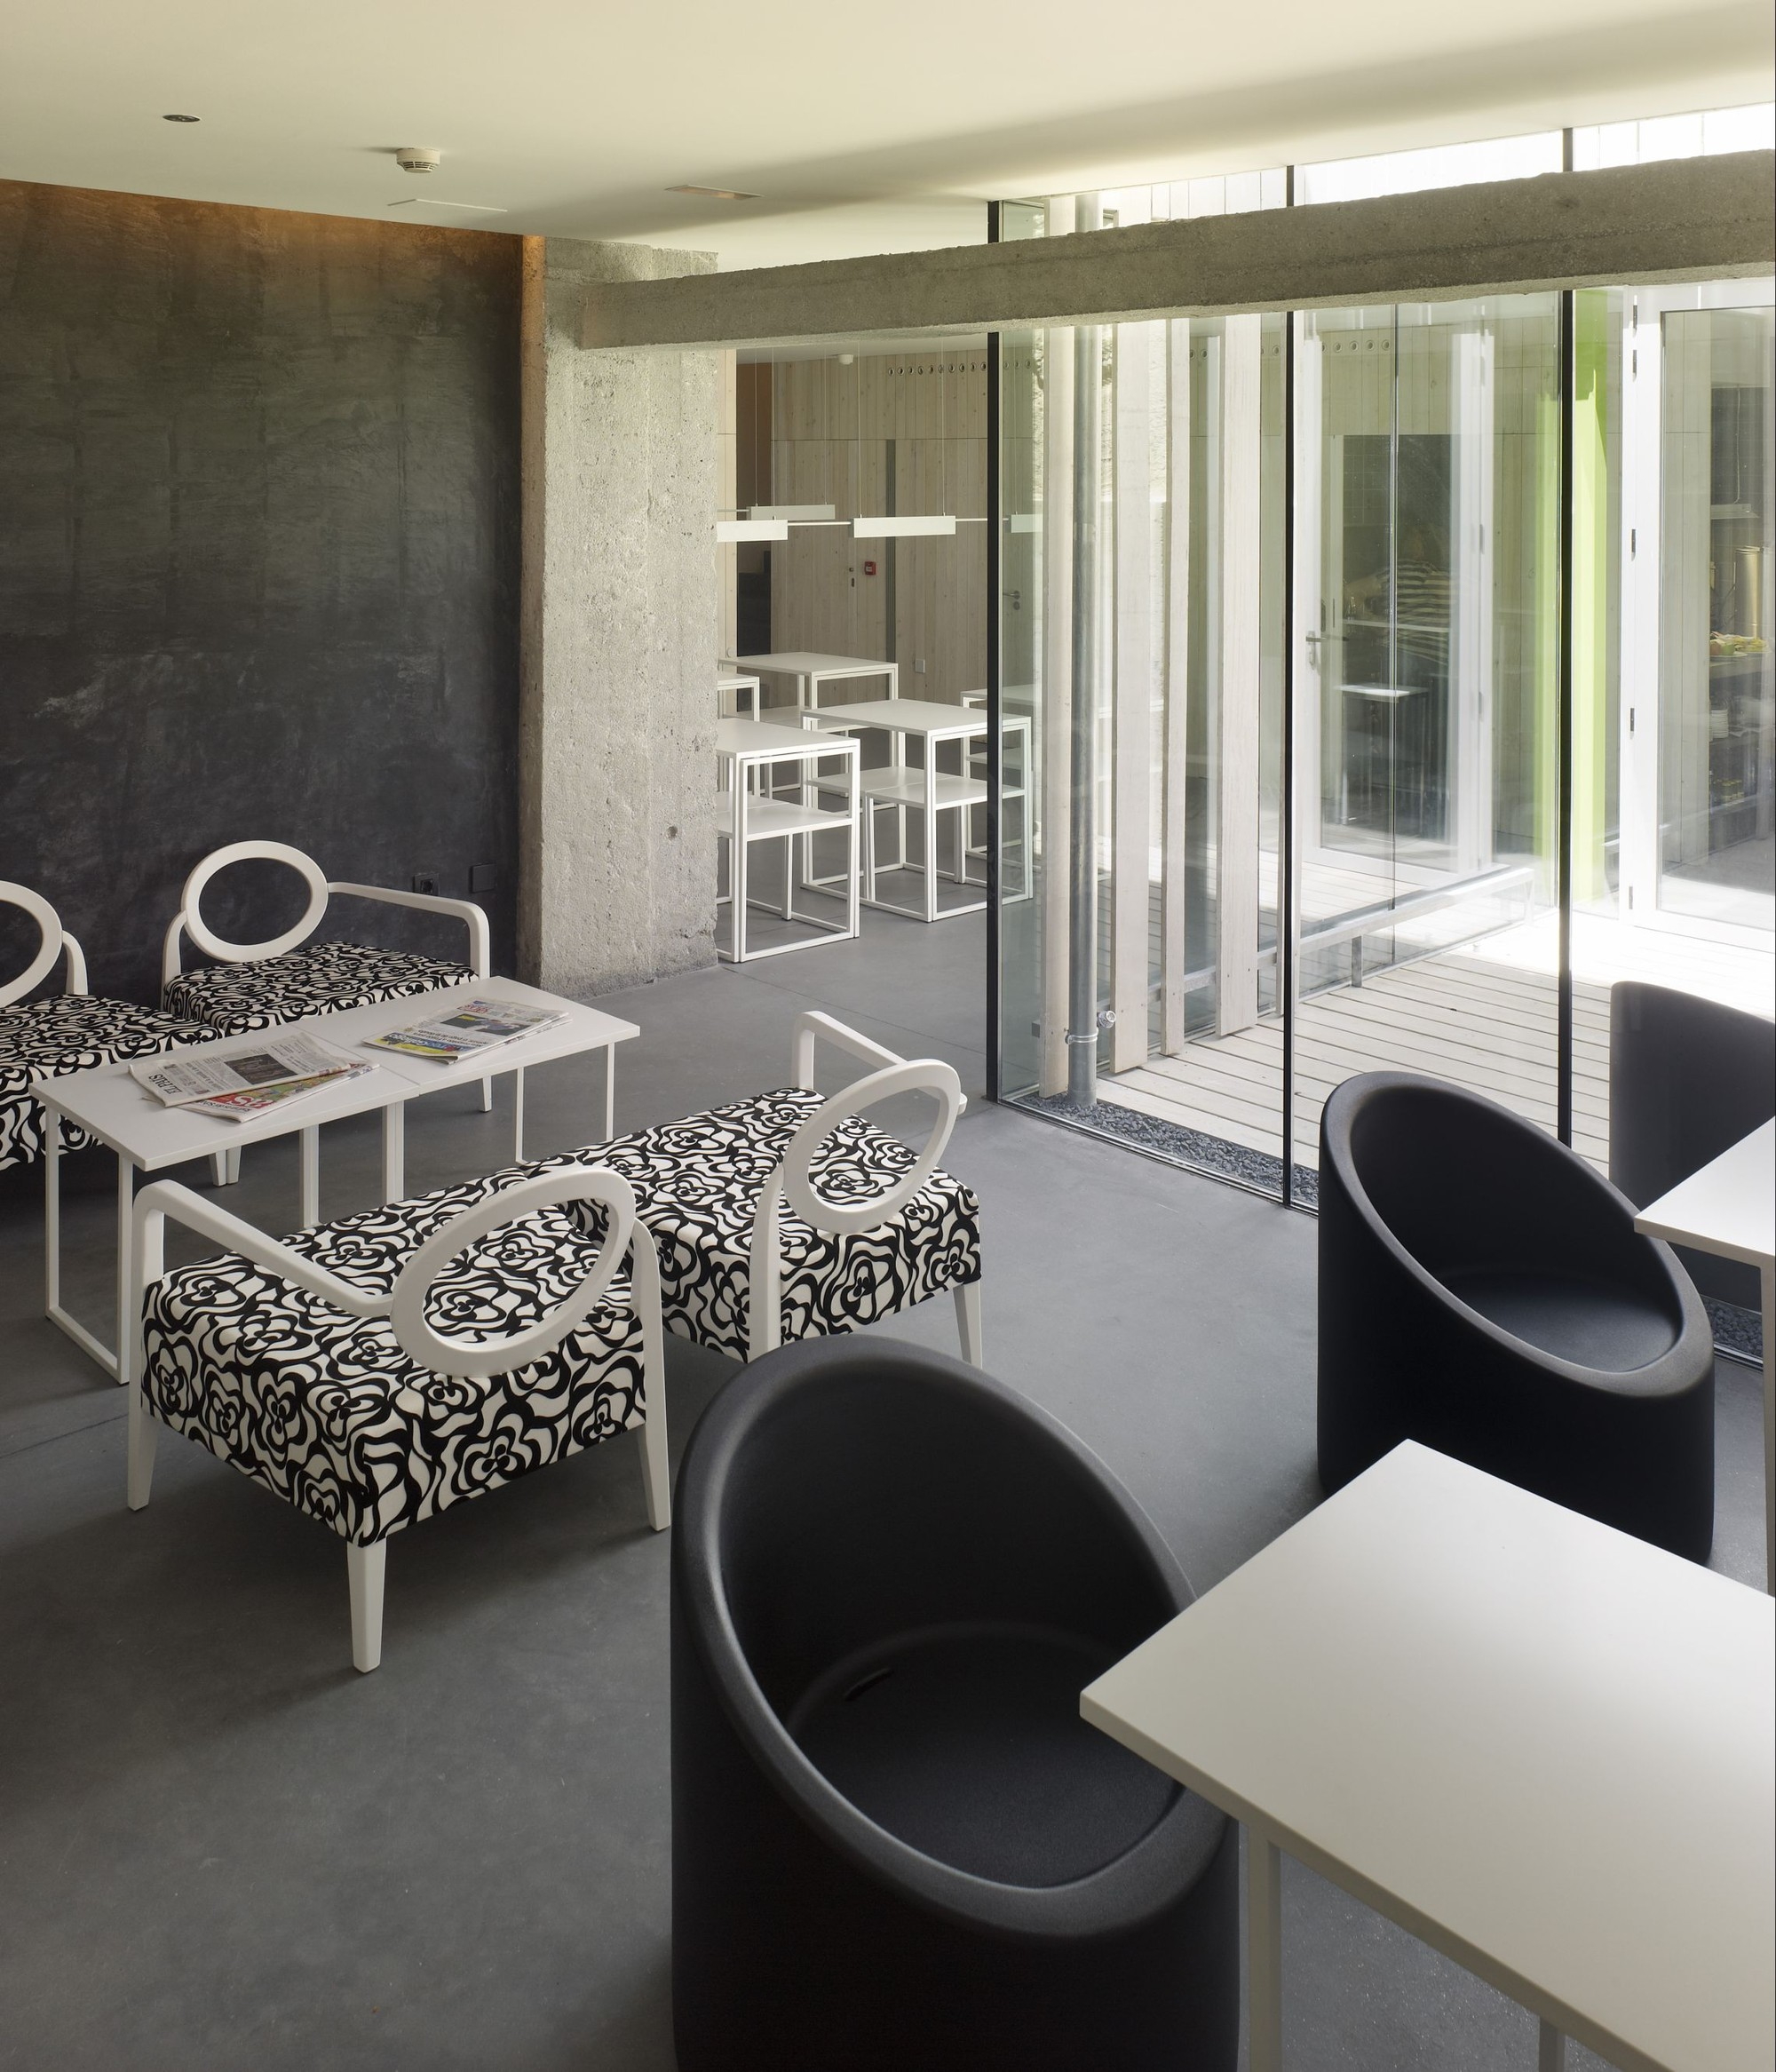 Rehabilitation Hotel Moure / Abalo Alonso Arquitectos